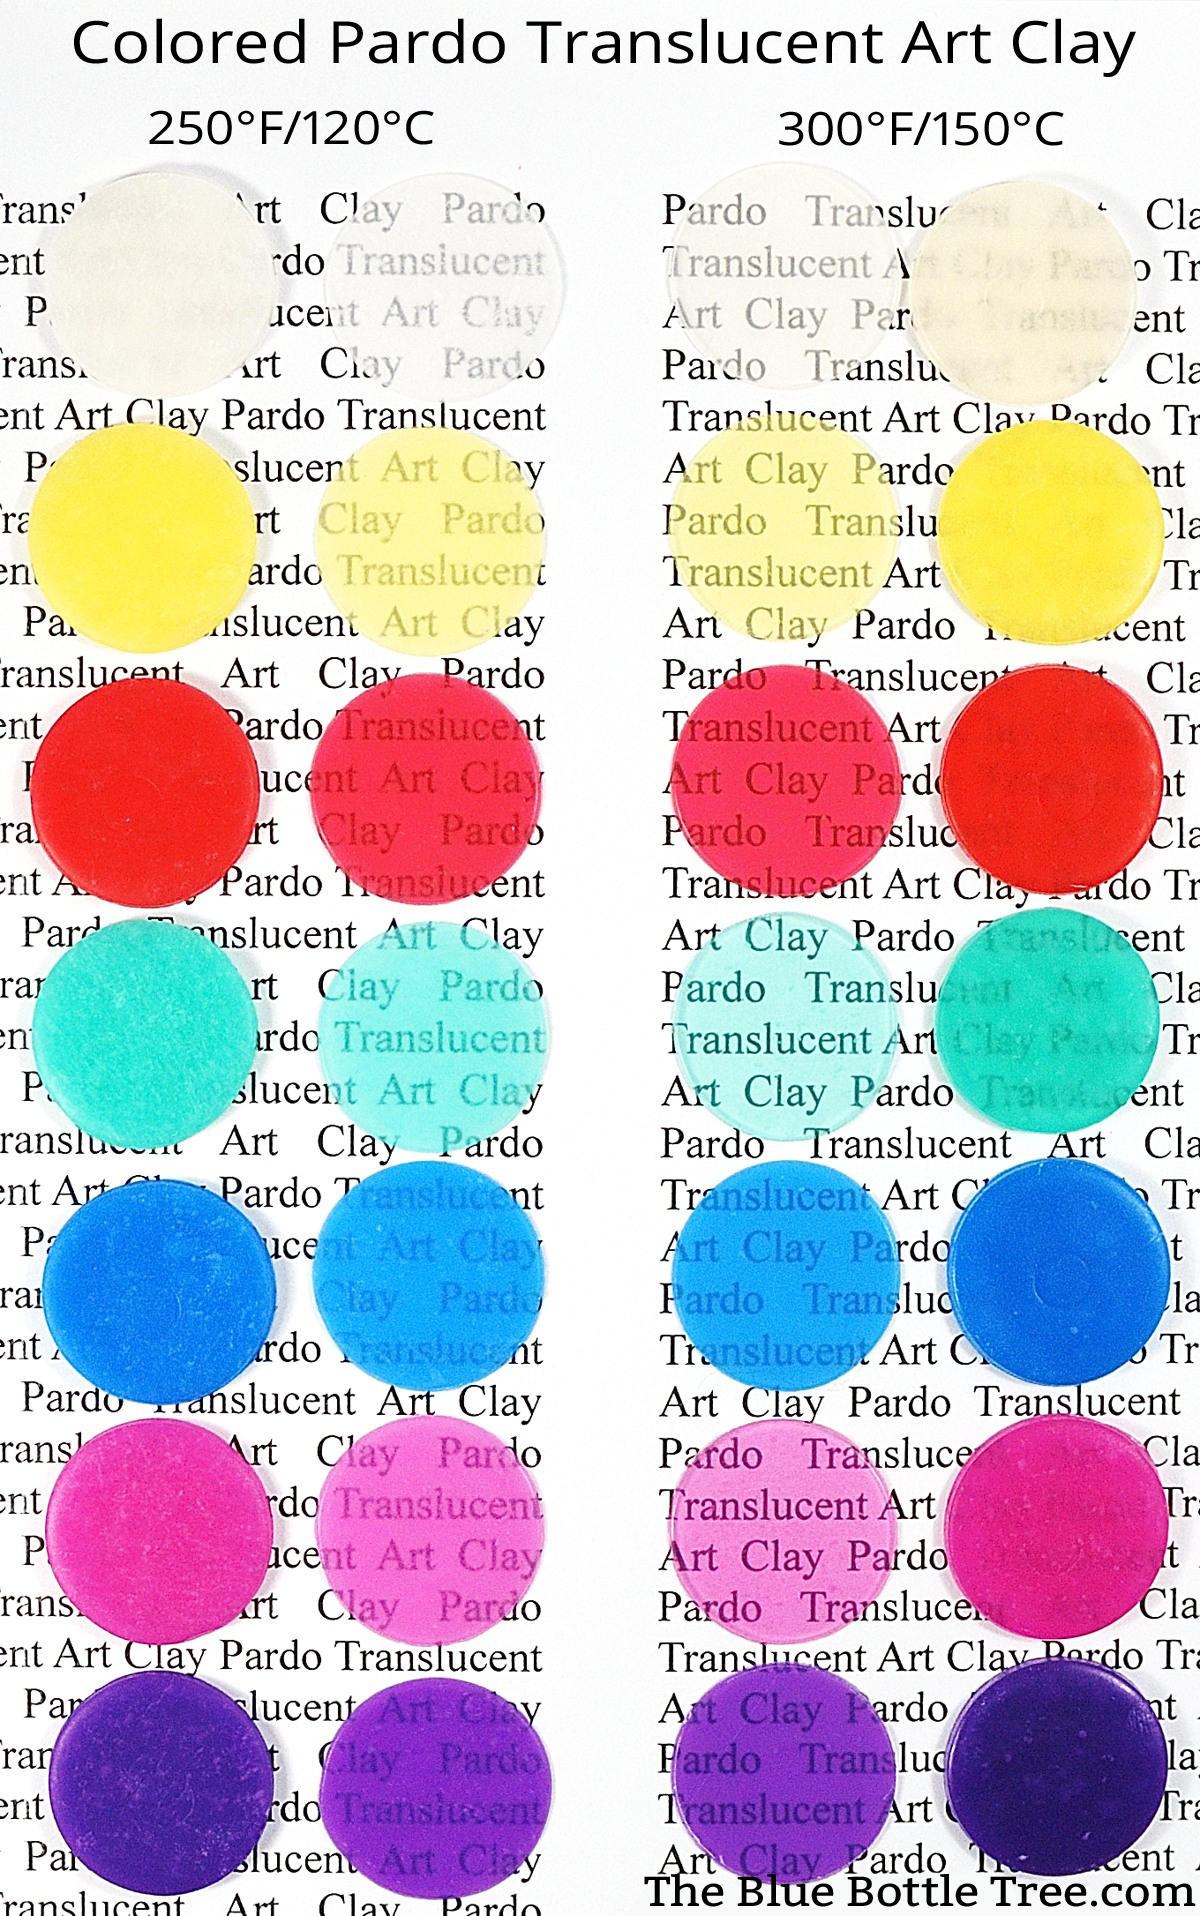 Pardo Colored Translucent Clay